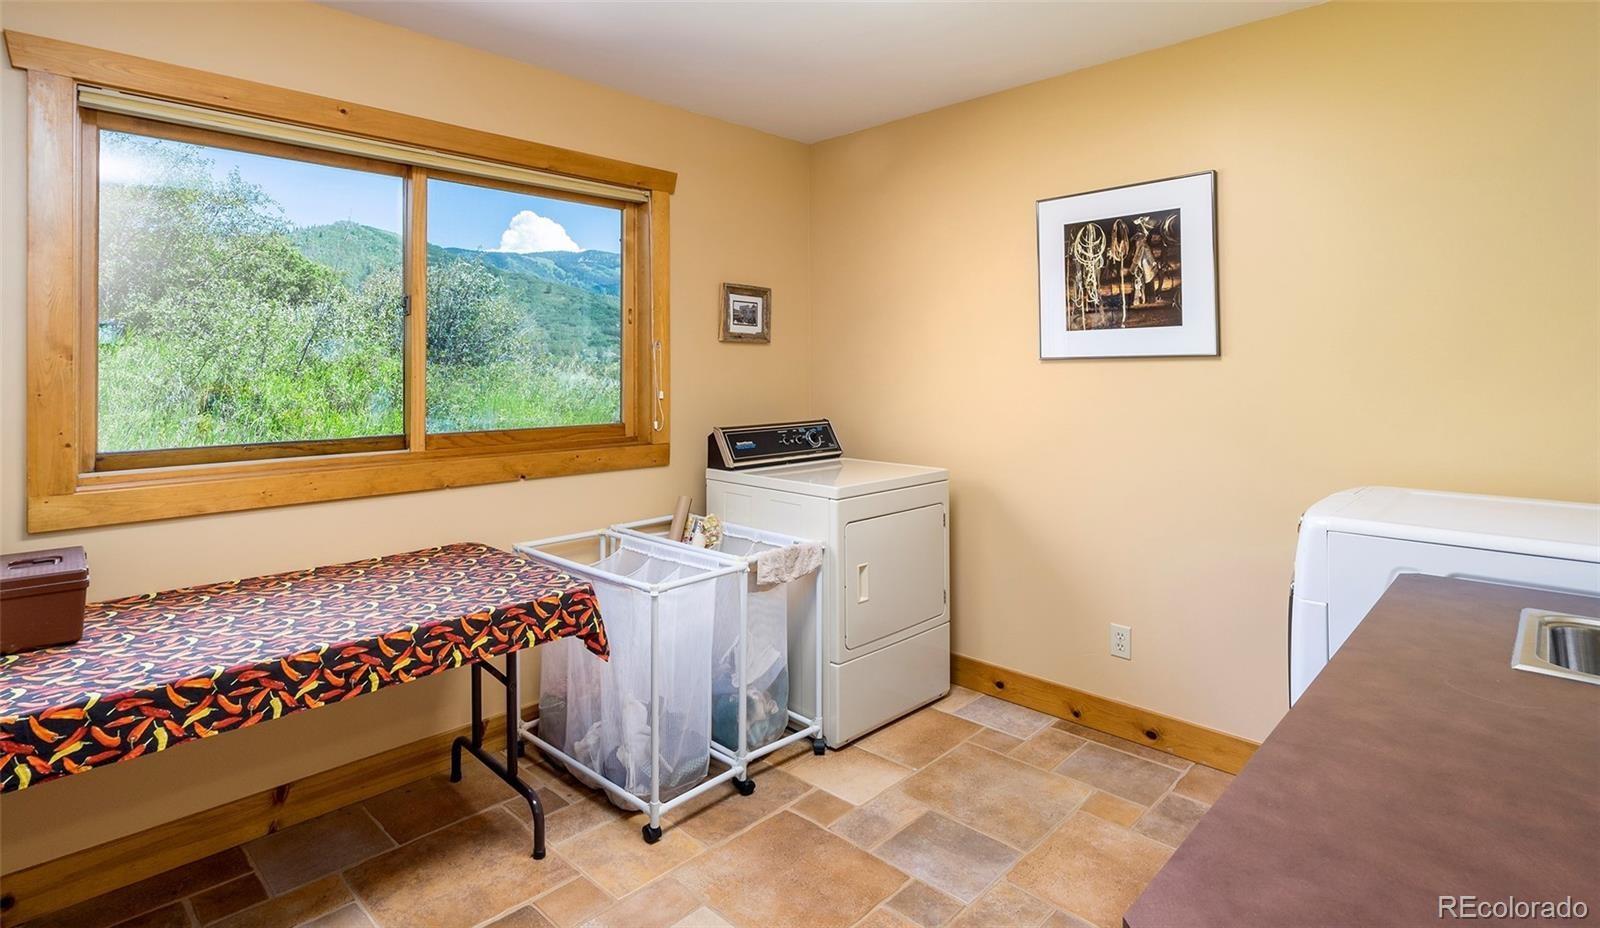 MLS# 5297315 - 13 - 39100 County Road 34 , Steamboat Springs, CO 80487